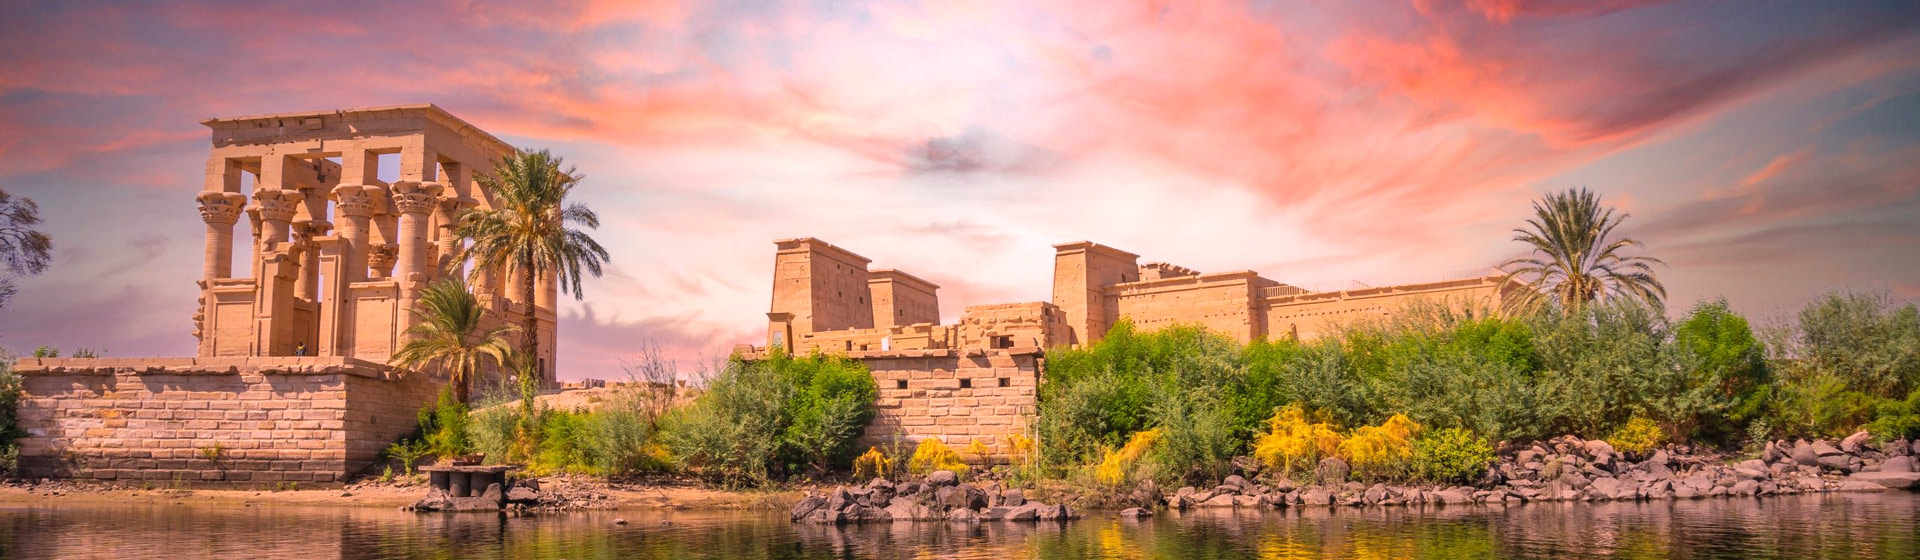 Maravillas Del Nilo